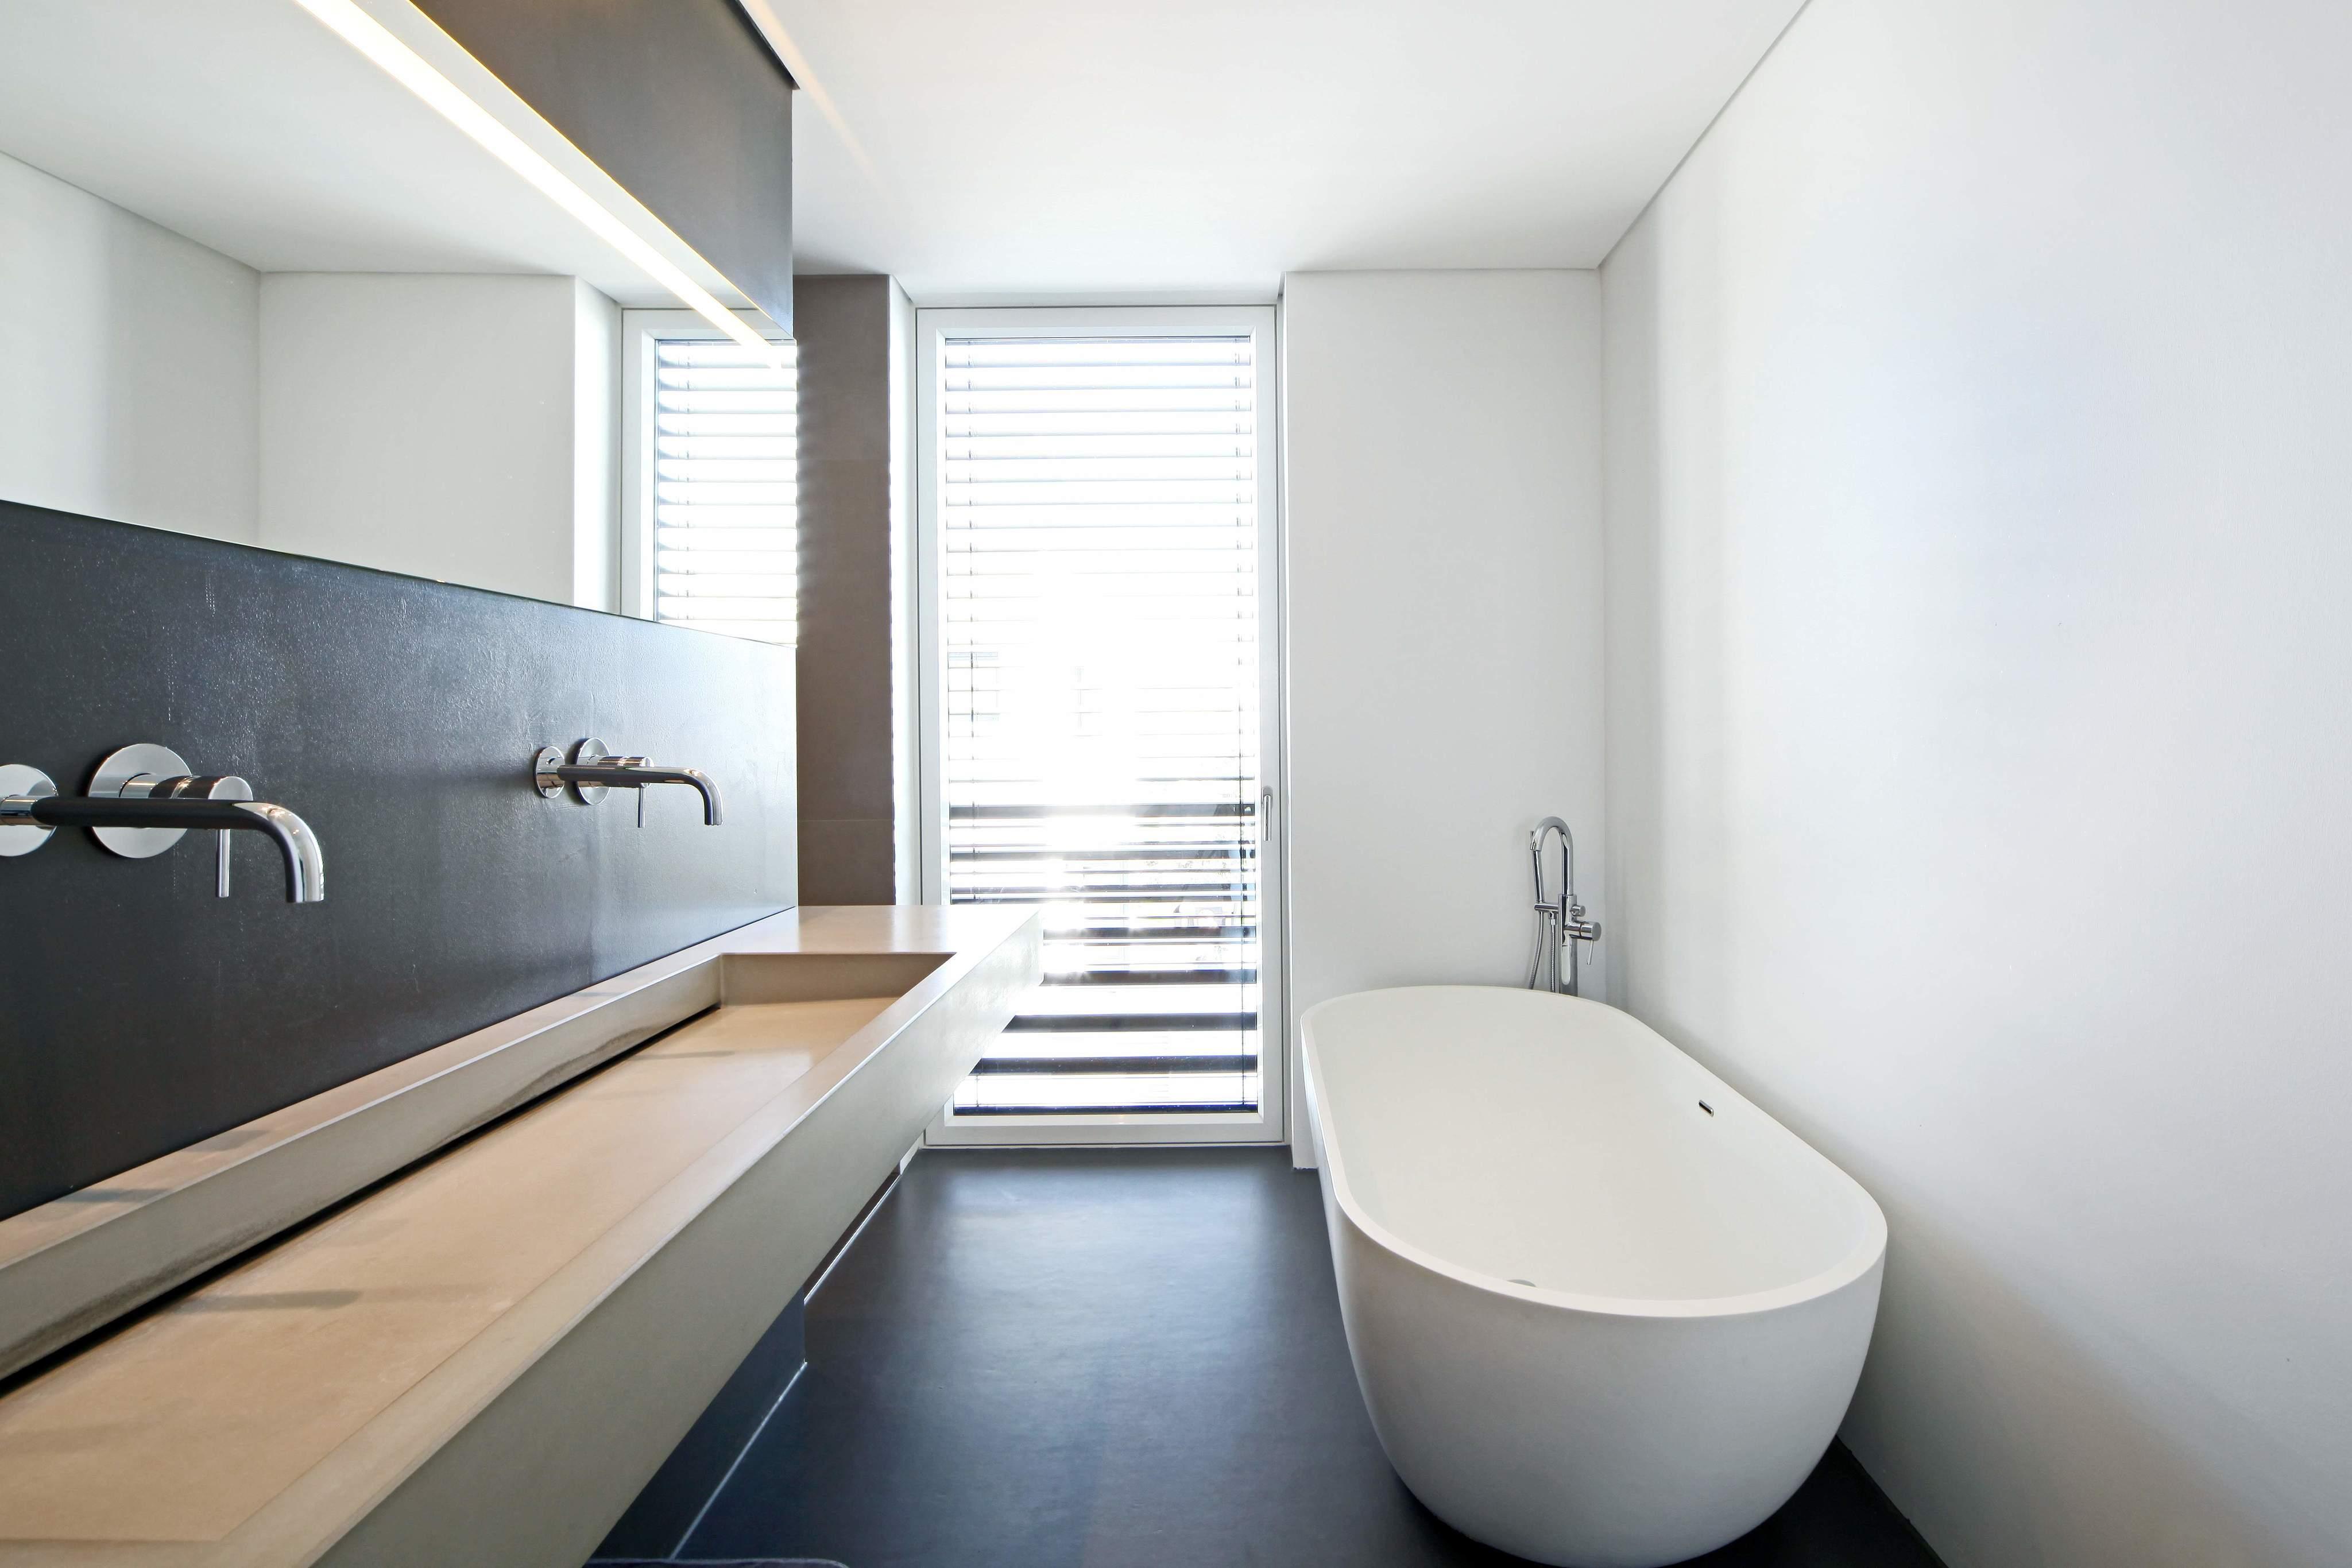 Betonbad bilder ideen couchstyle for Bad waschtisch ideen